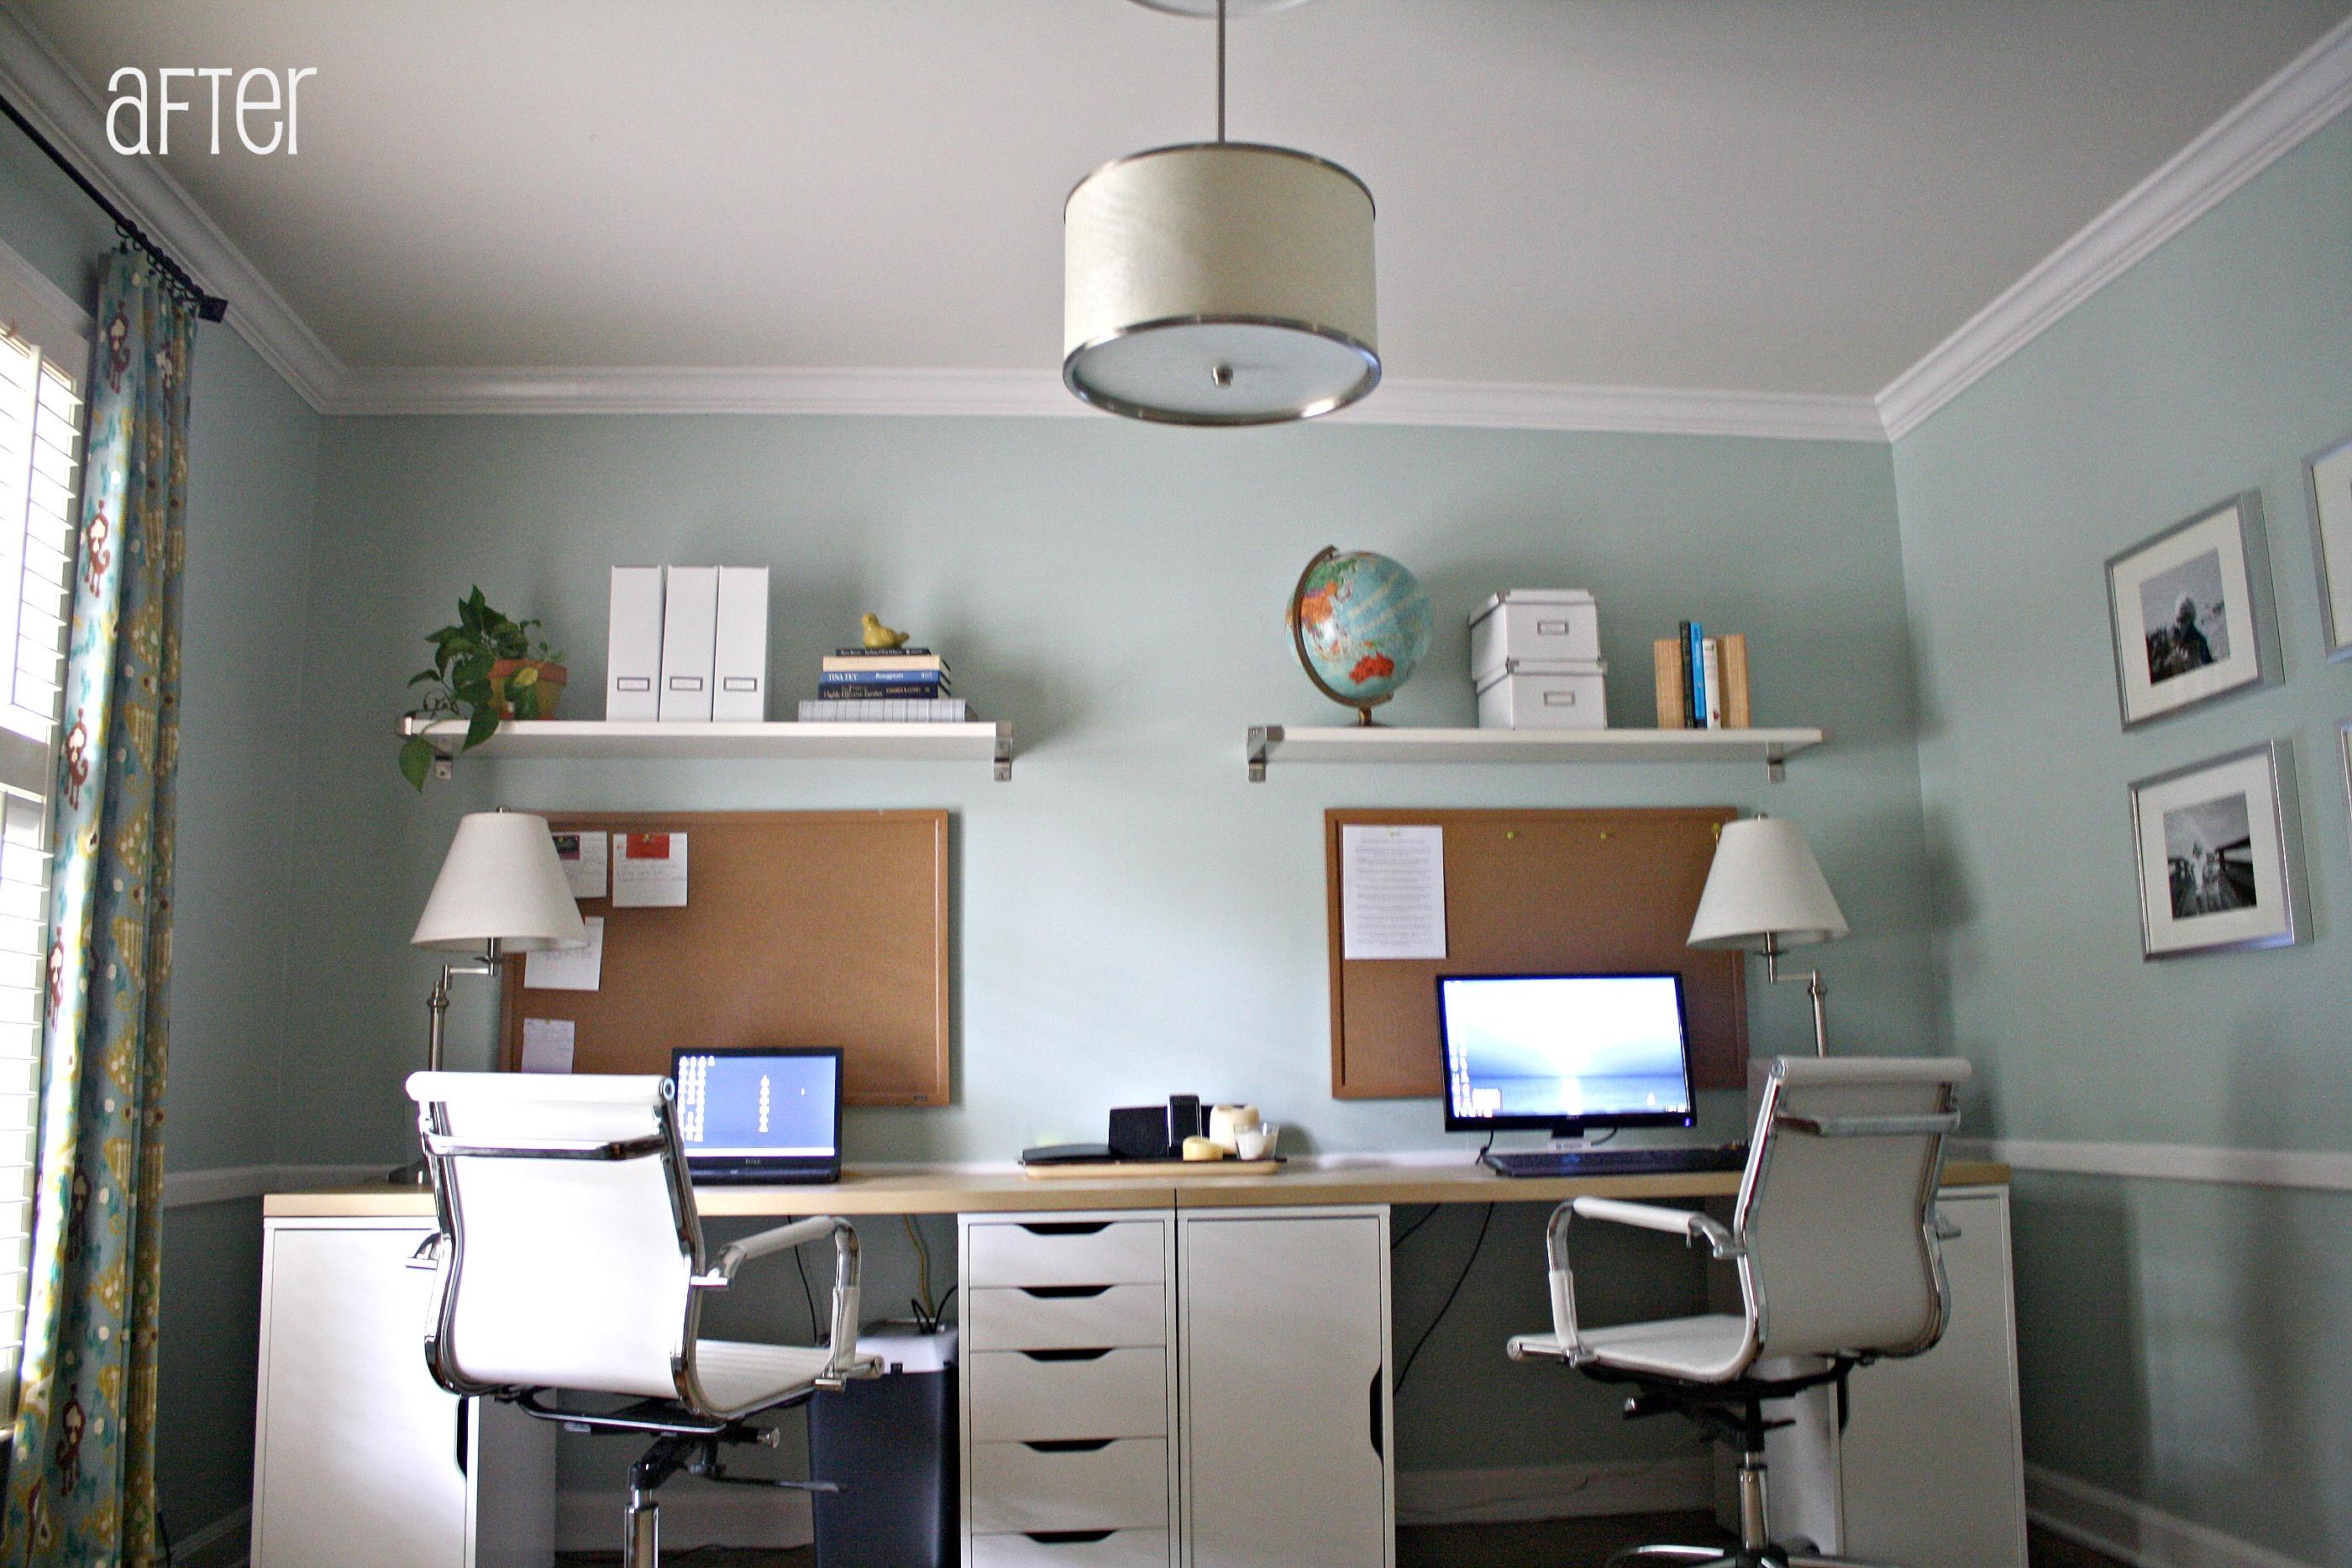 Wondrous Dicas Para Montar Seu Home Office E Mais Alguns Conselhos Para Largest Home Design Picture Inspirations Pitcheantrous